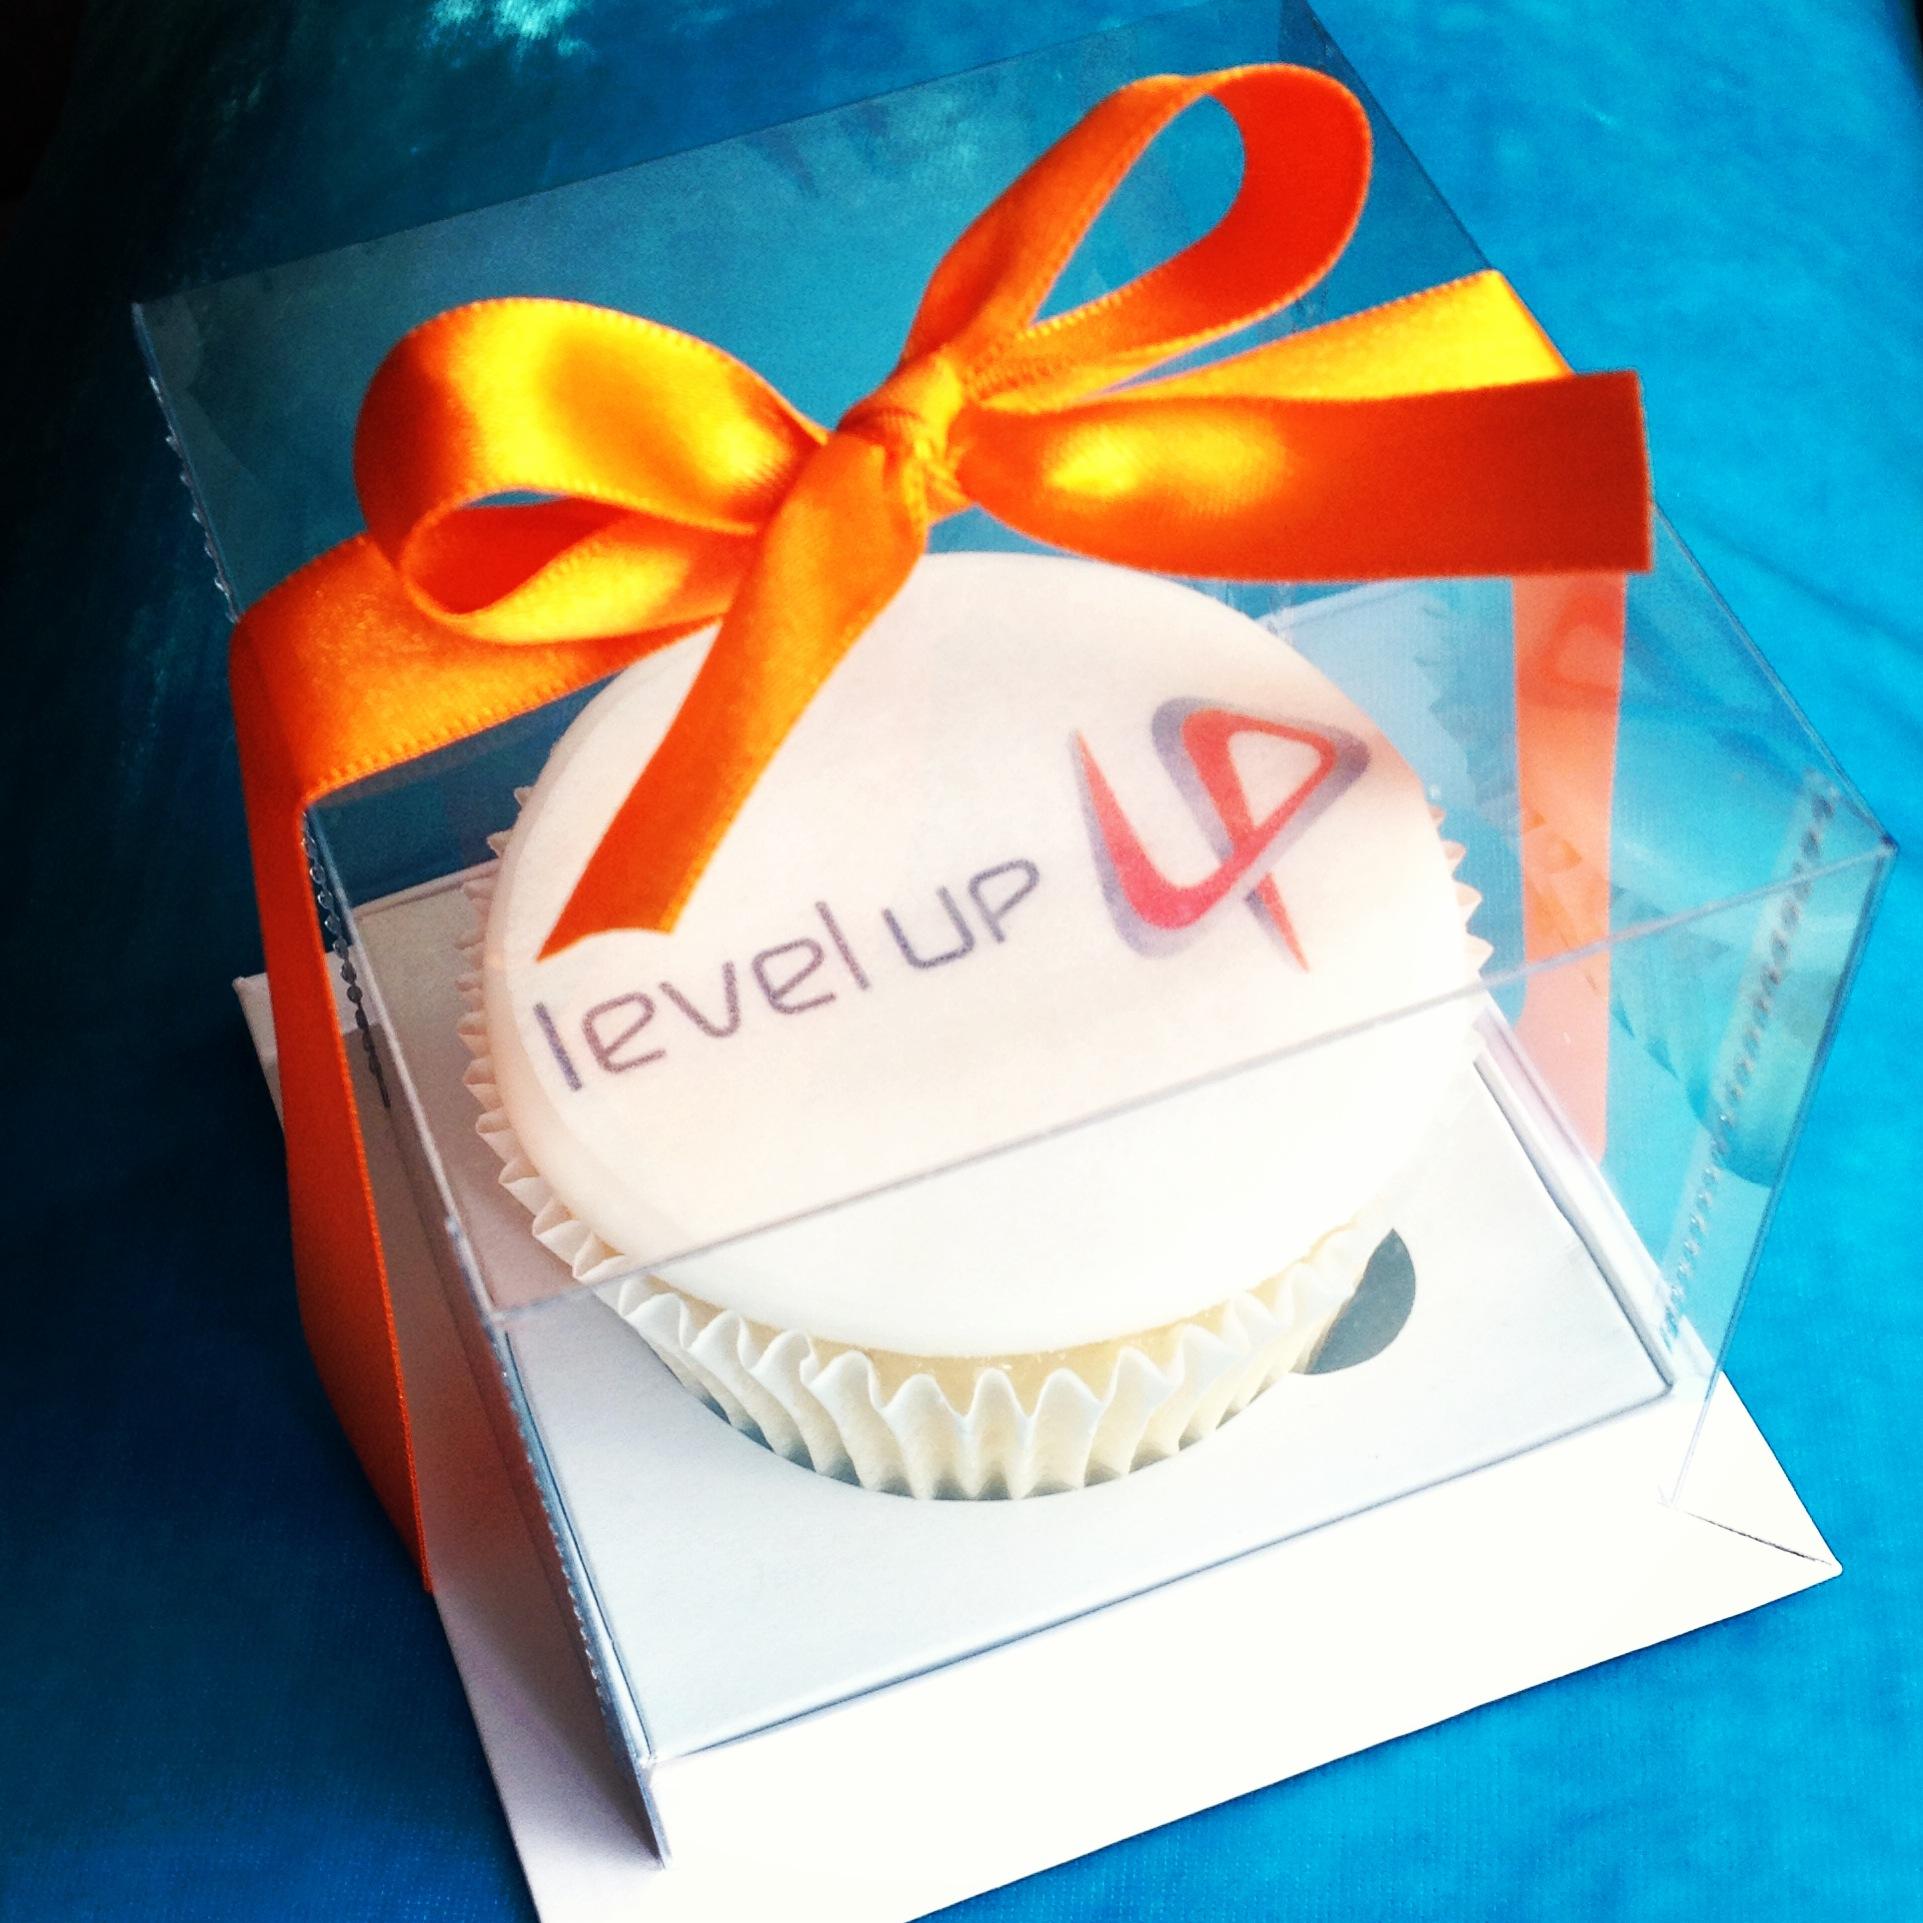 Cupcake Empresa Cake Me Up Cupcakes Em Sp Pagina 2